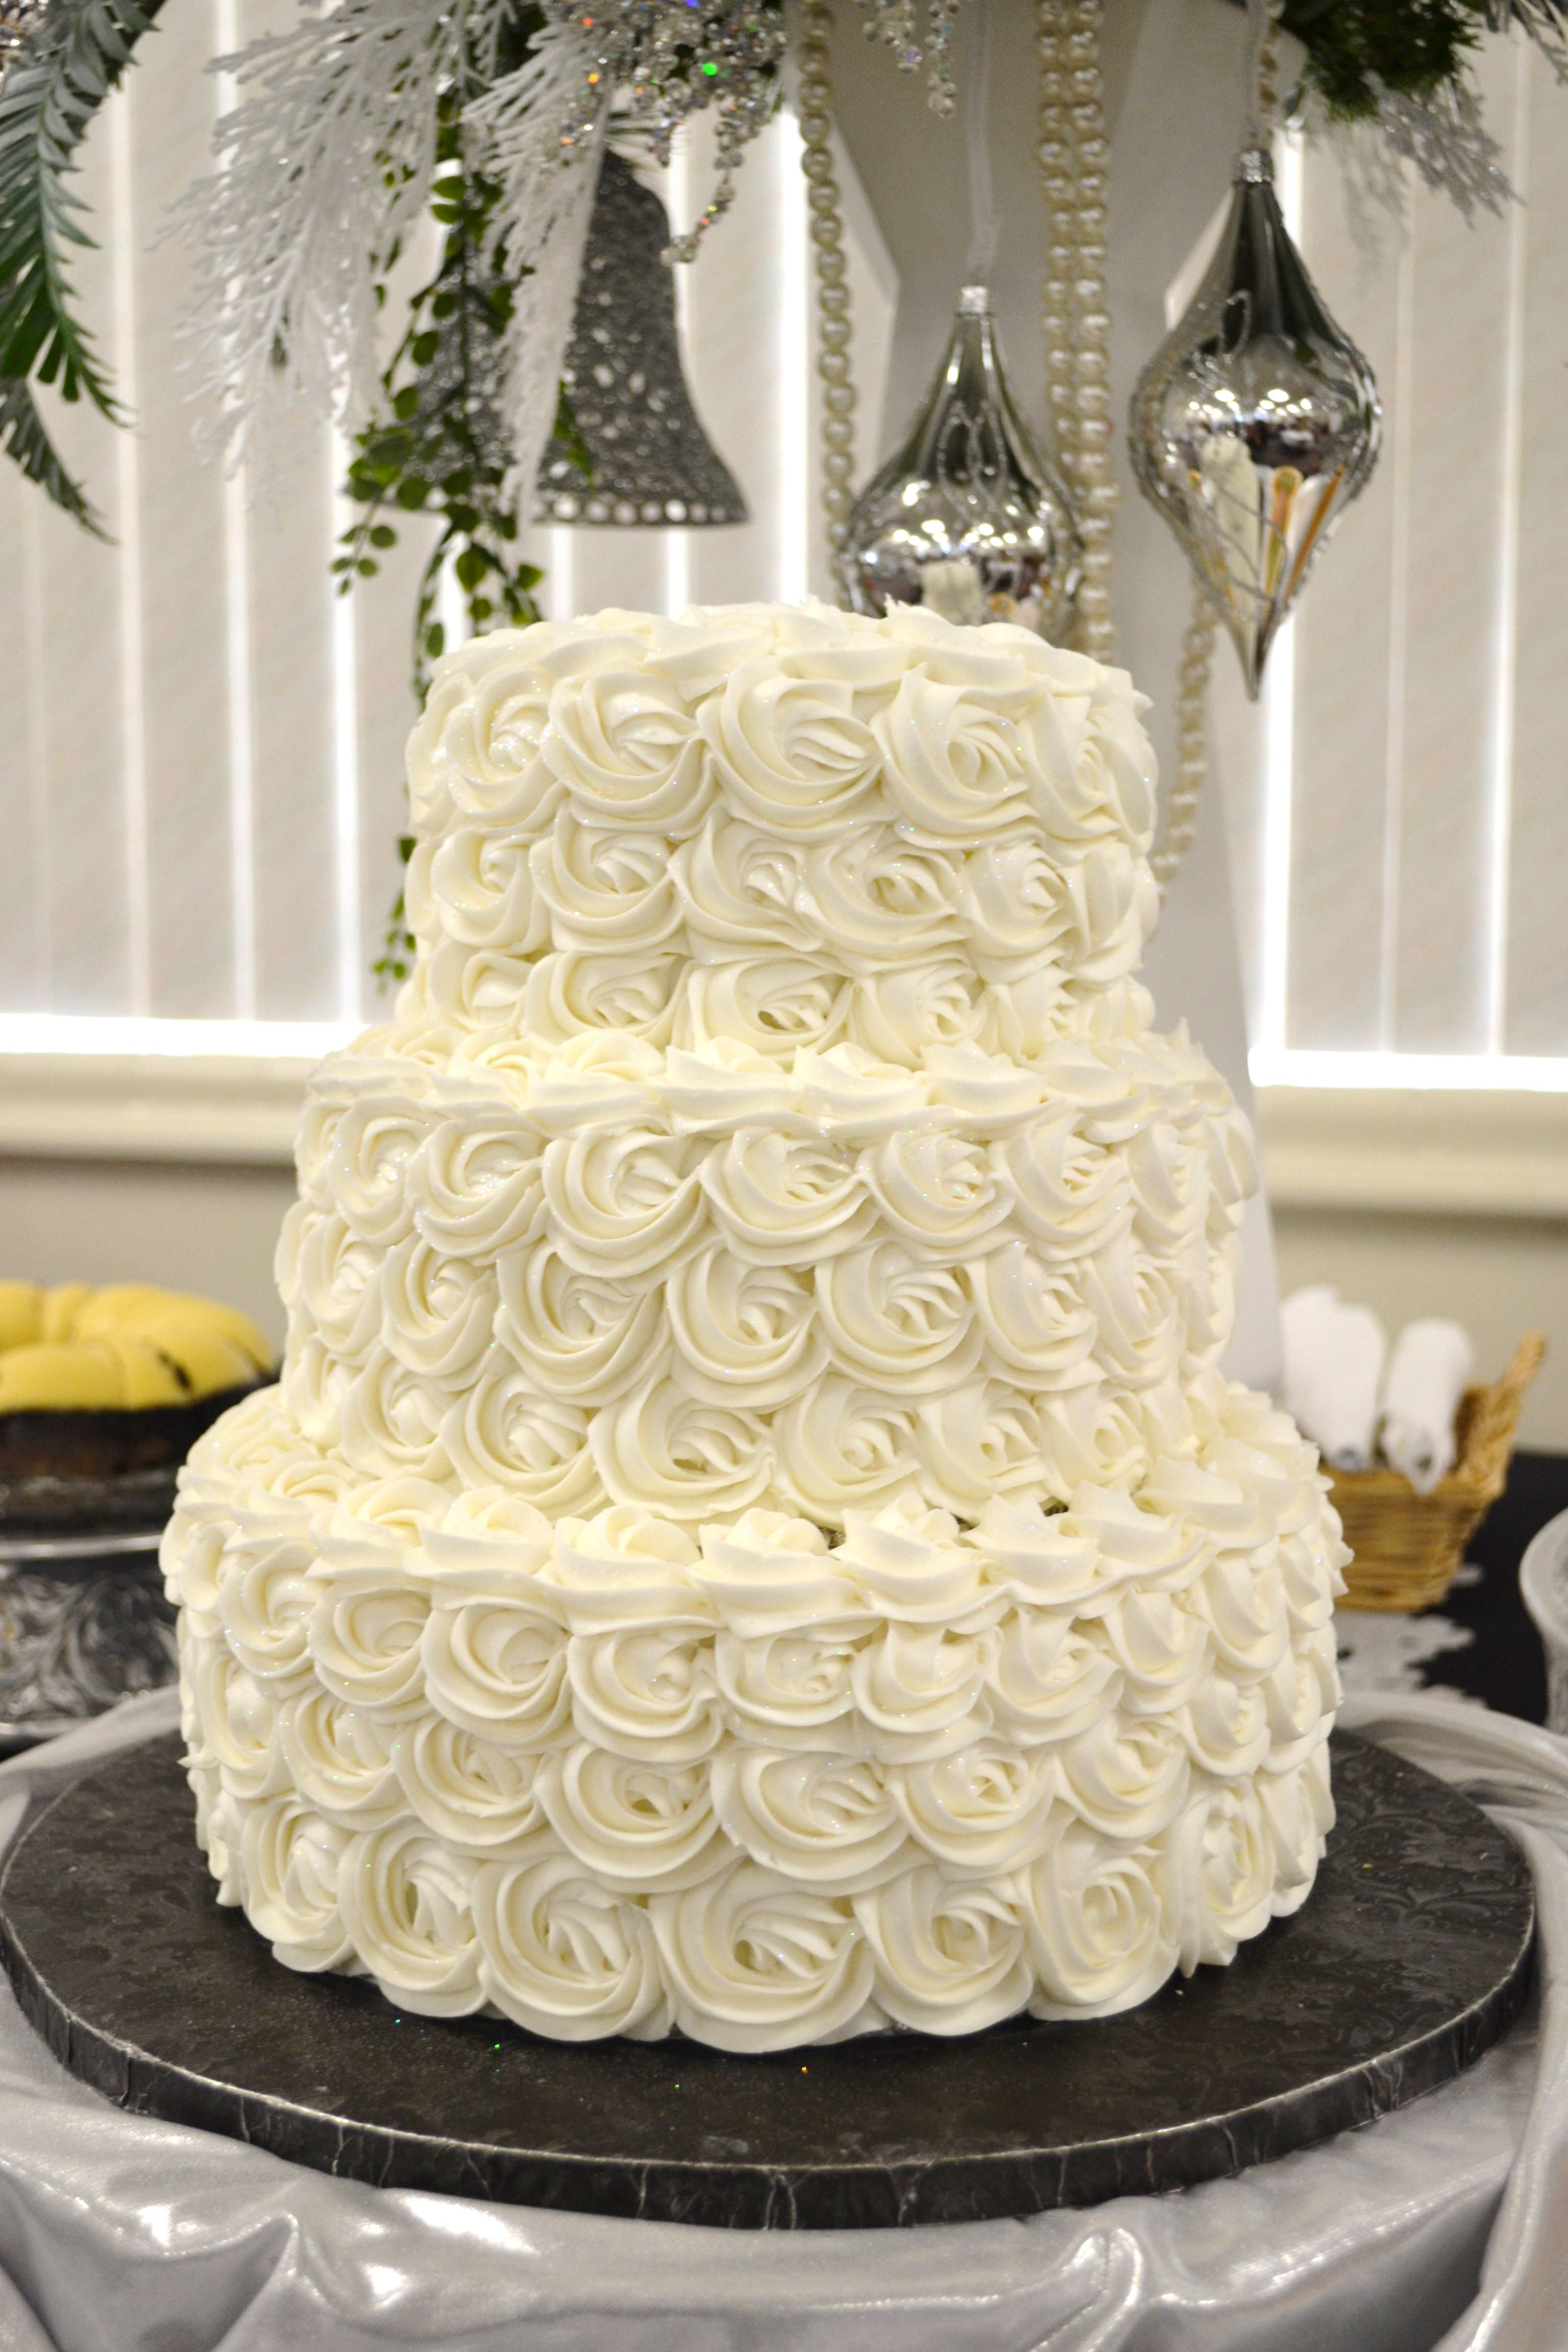 Wedding Cakes 3 Tier  3 tiered wedding cakes idea in 2017